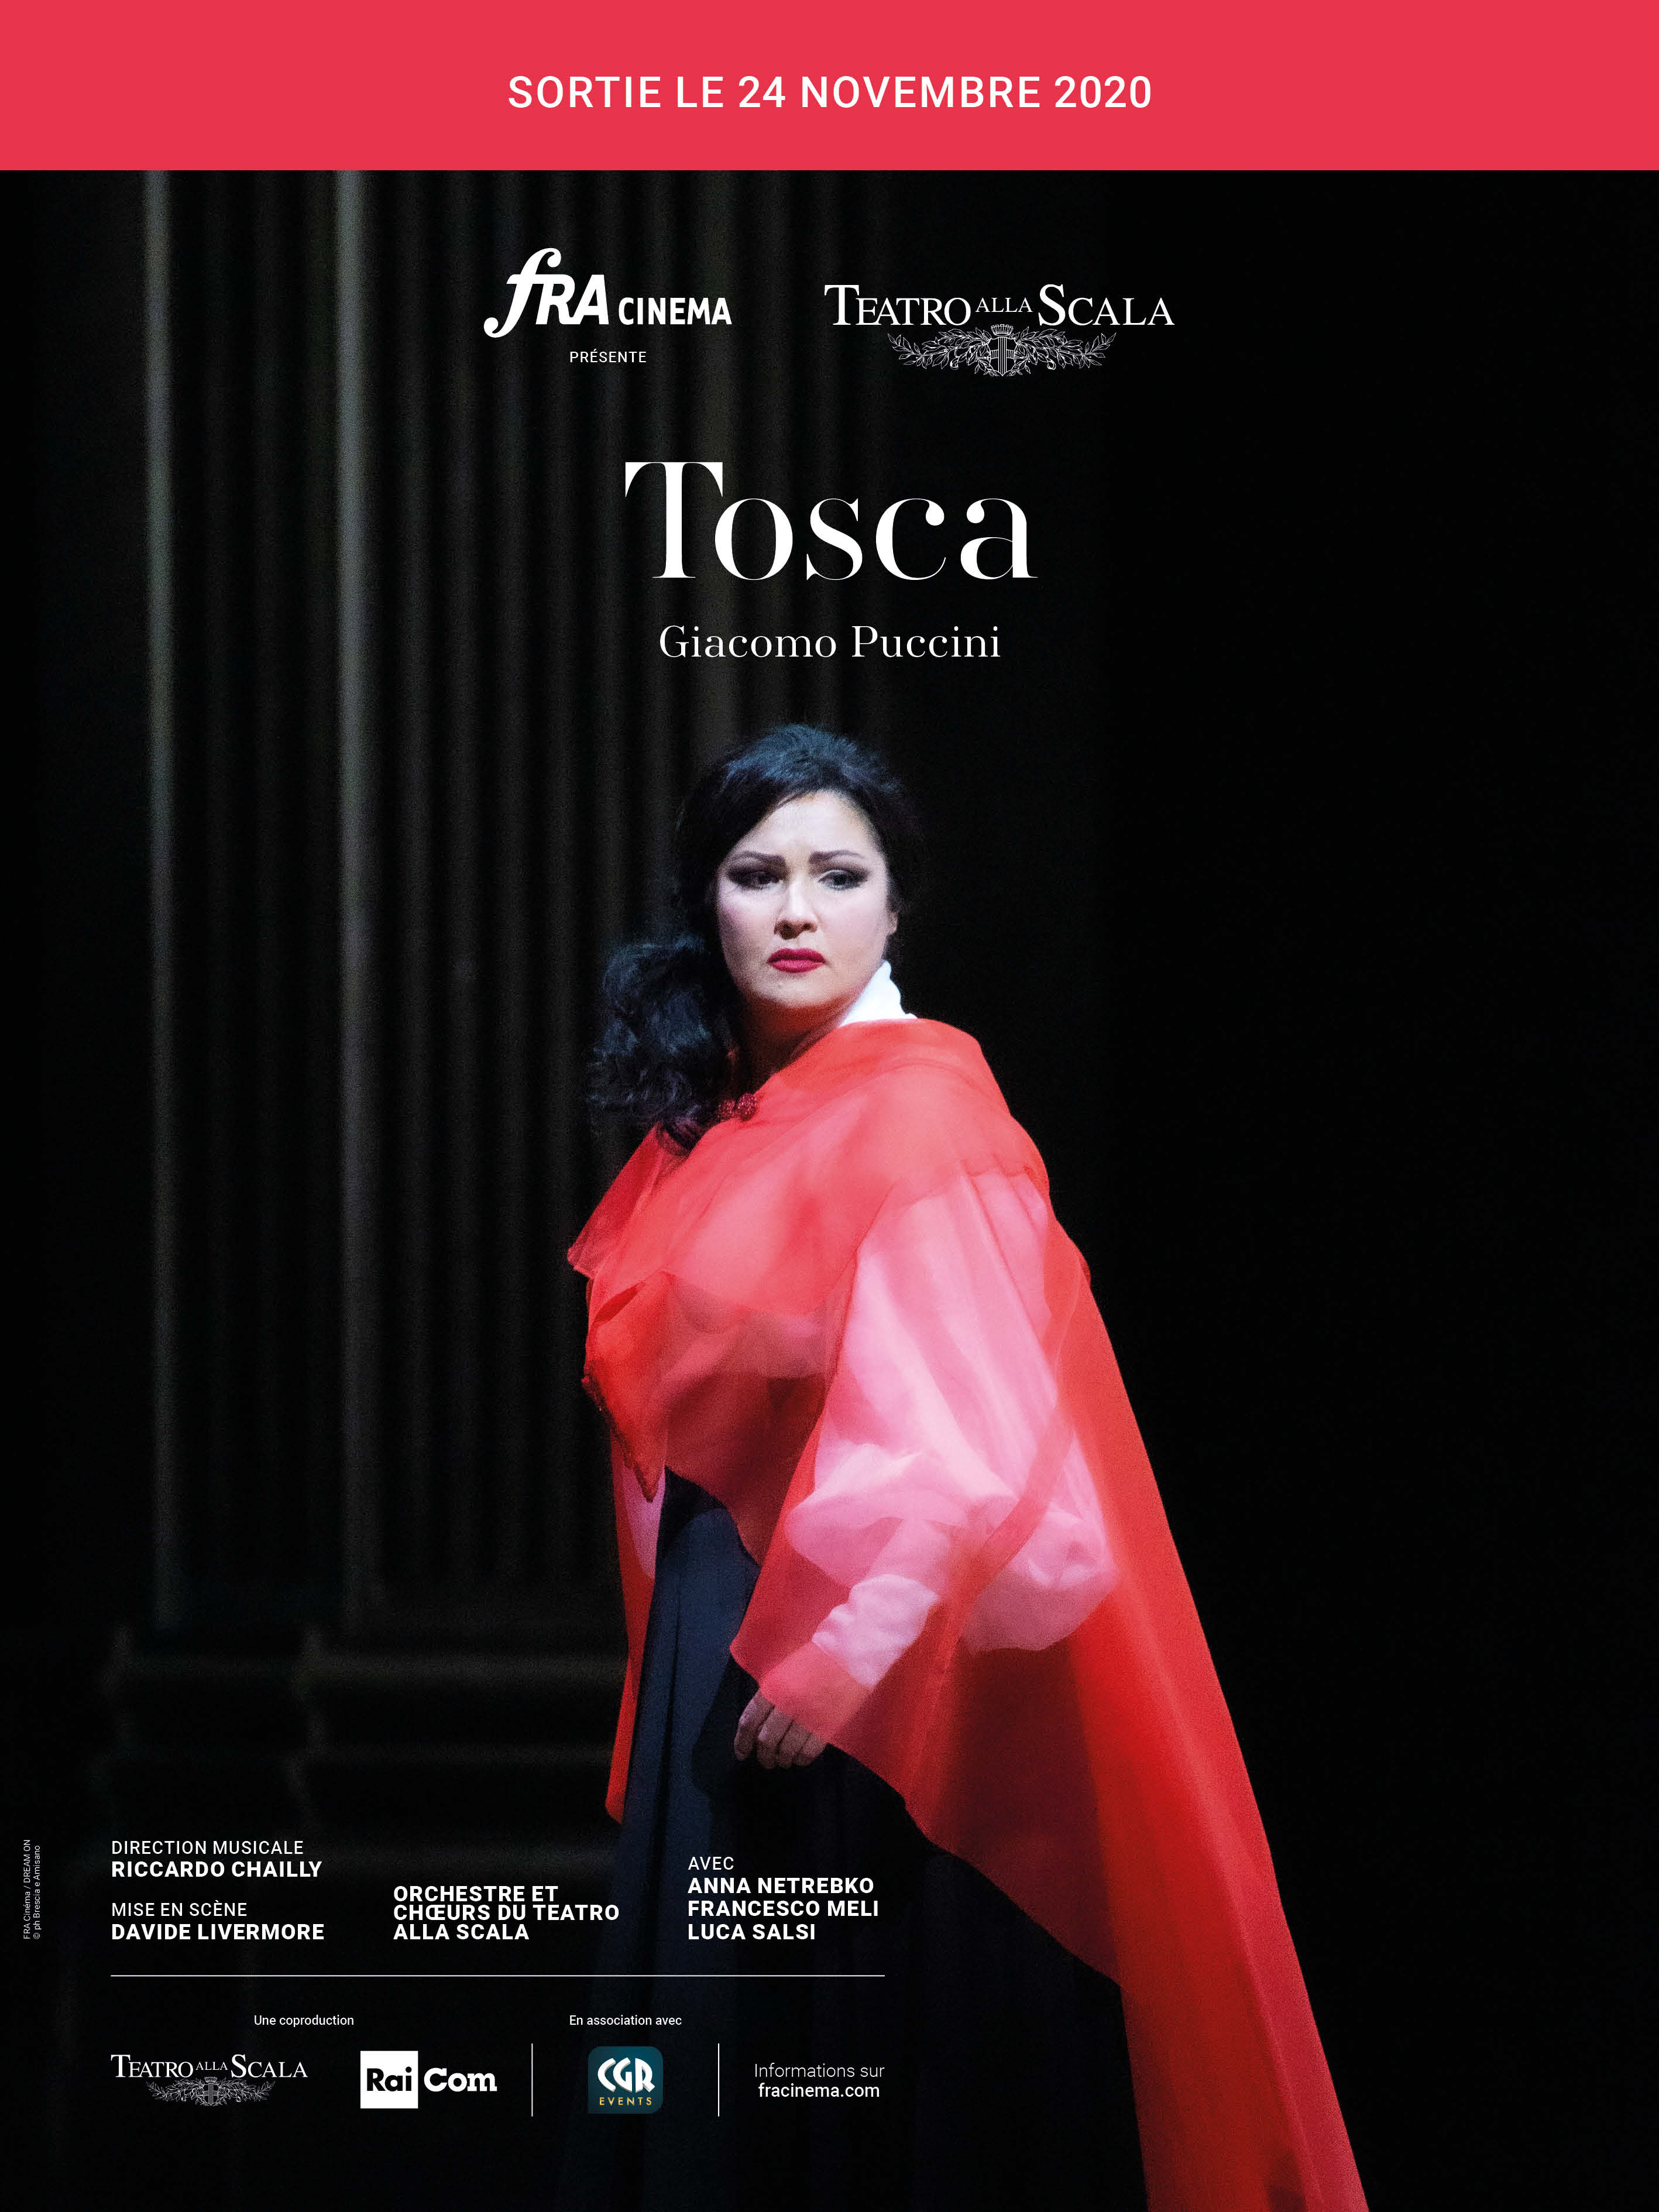 Tosca (Teatro all Scala-FRA Cinéma)